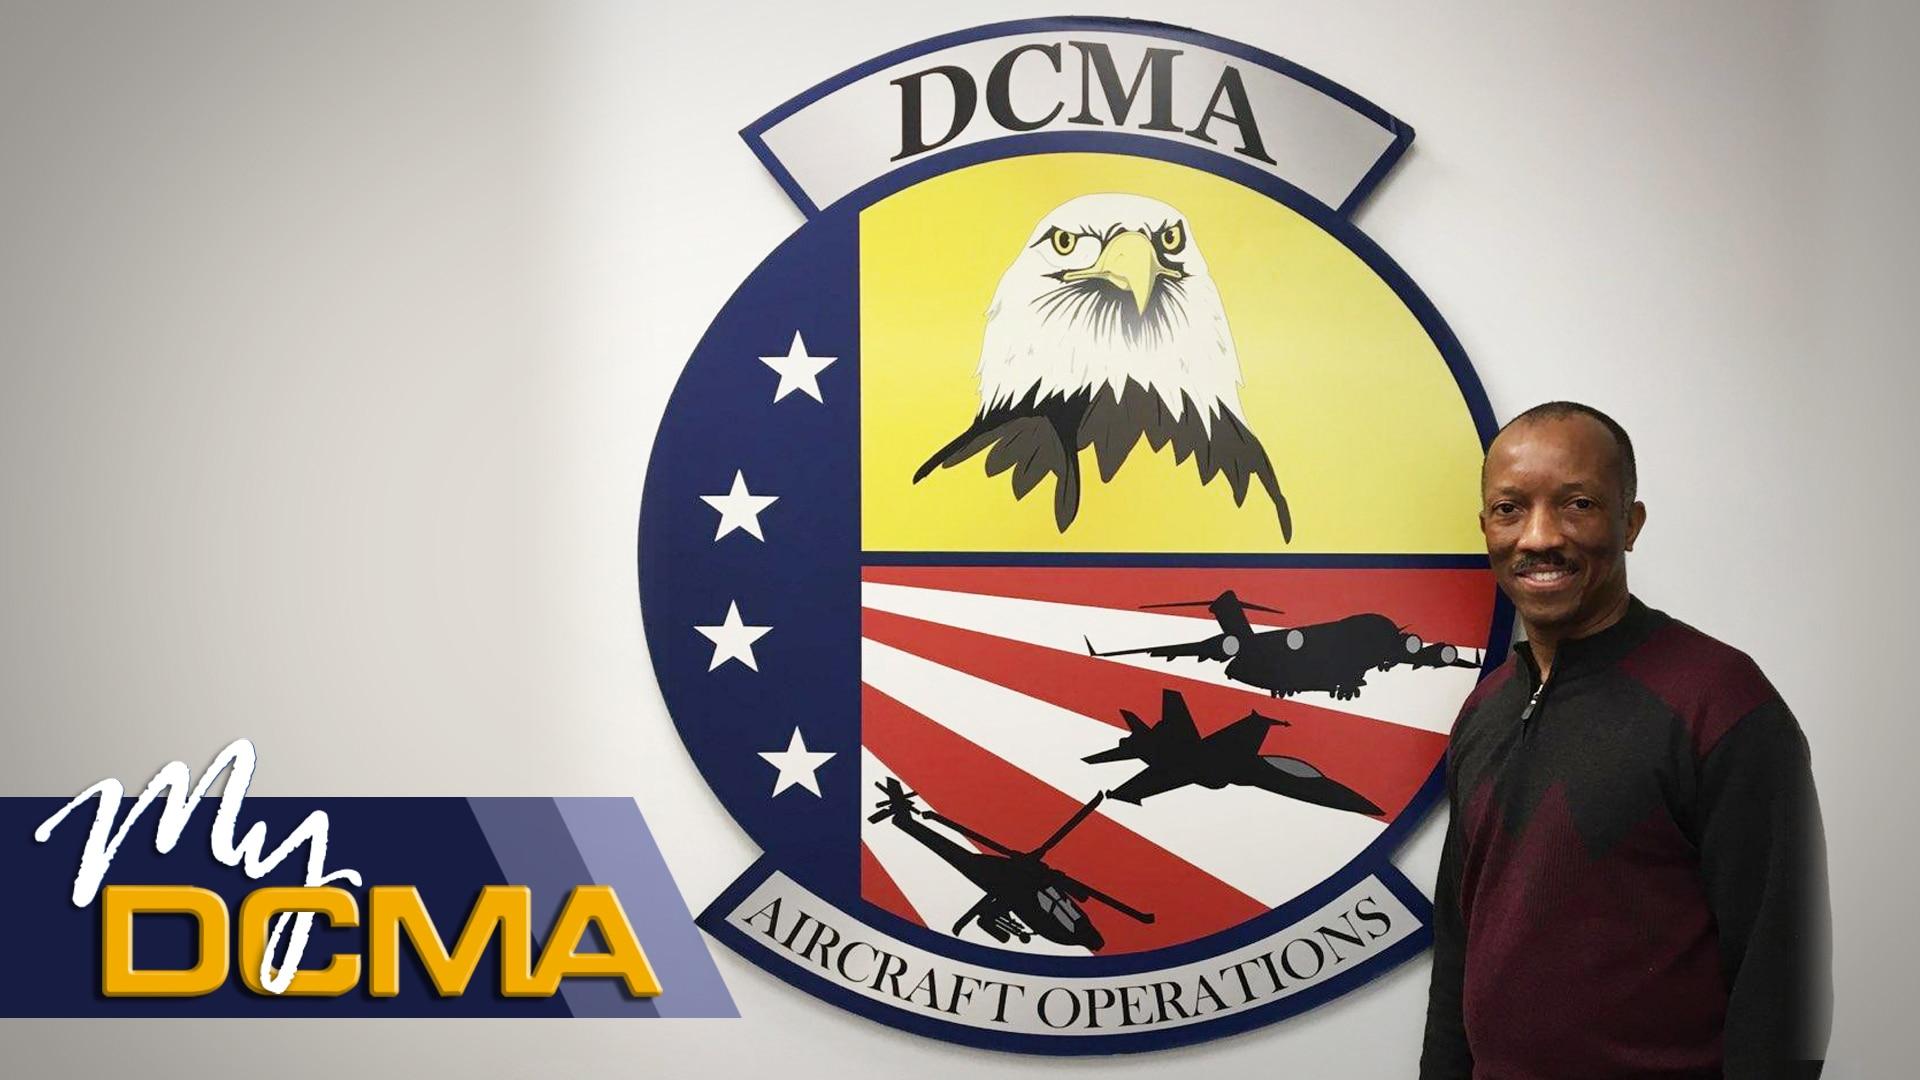 Man stands beside a DCMA sign.